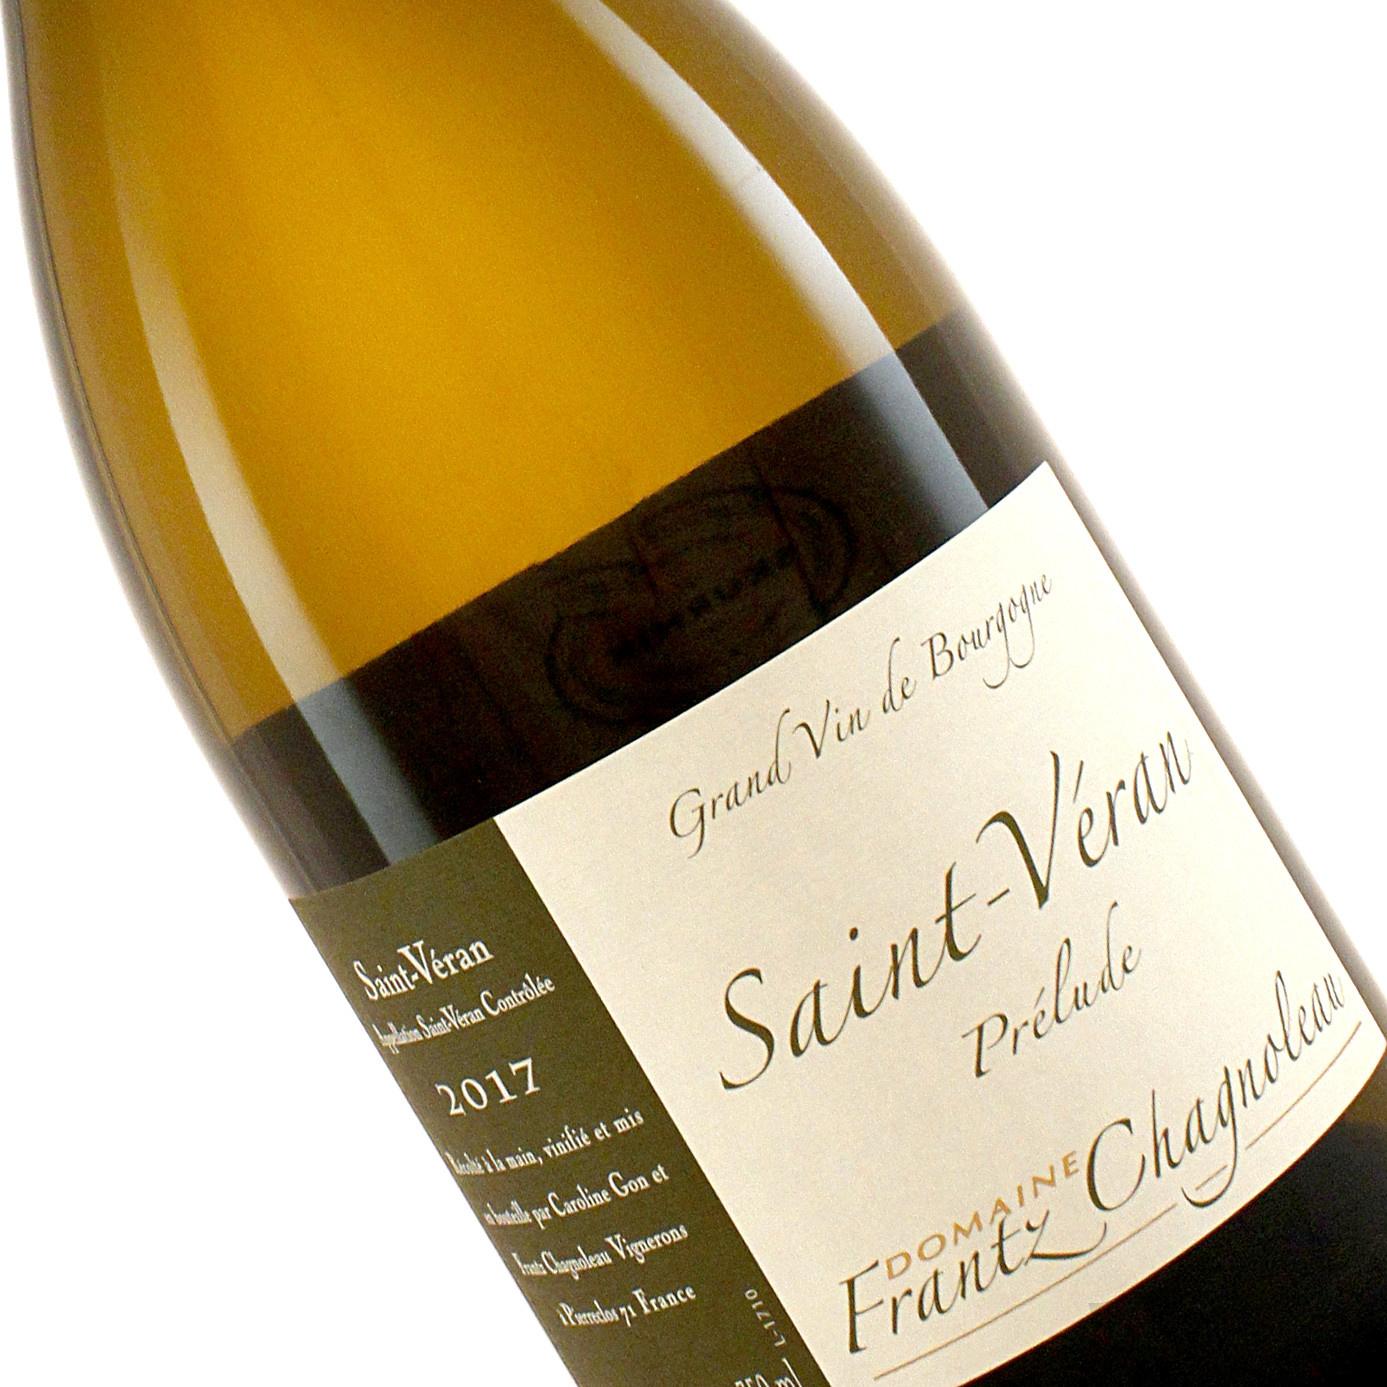 Frantz Chagnoleau 2017 Saint Veran Prelude, Burgundy